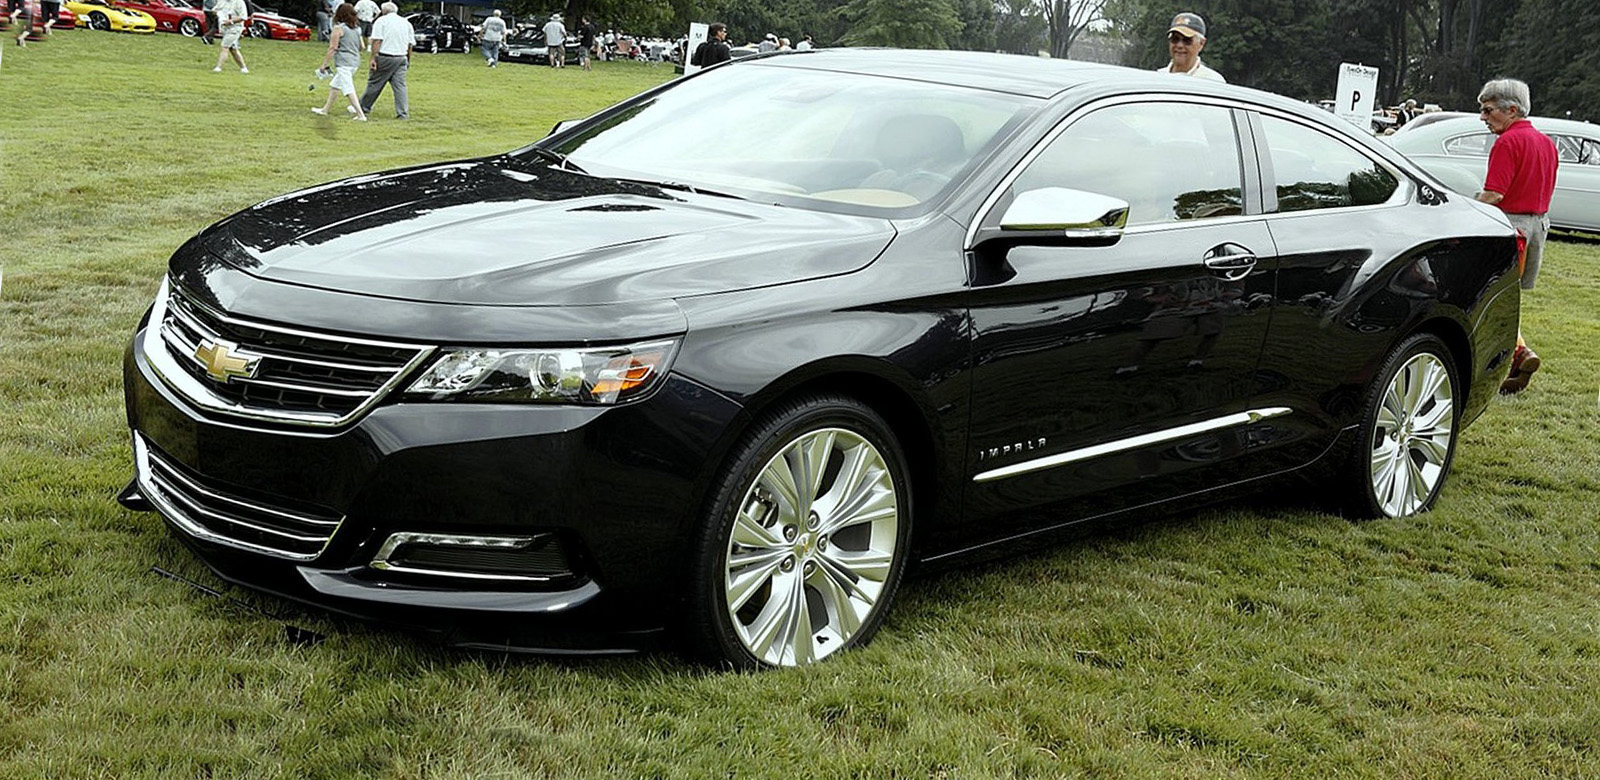 2015 Chevrolet Impala - Information and photos - ZombieDrive